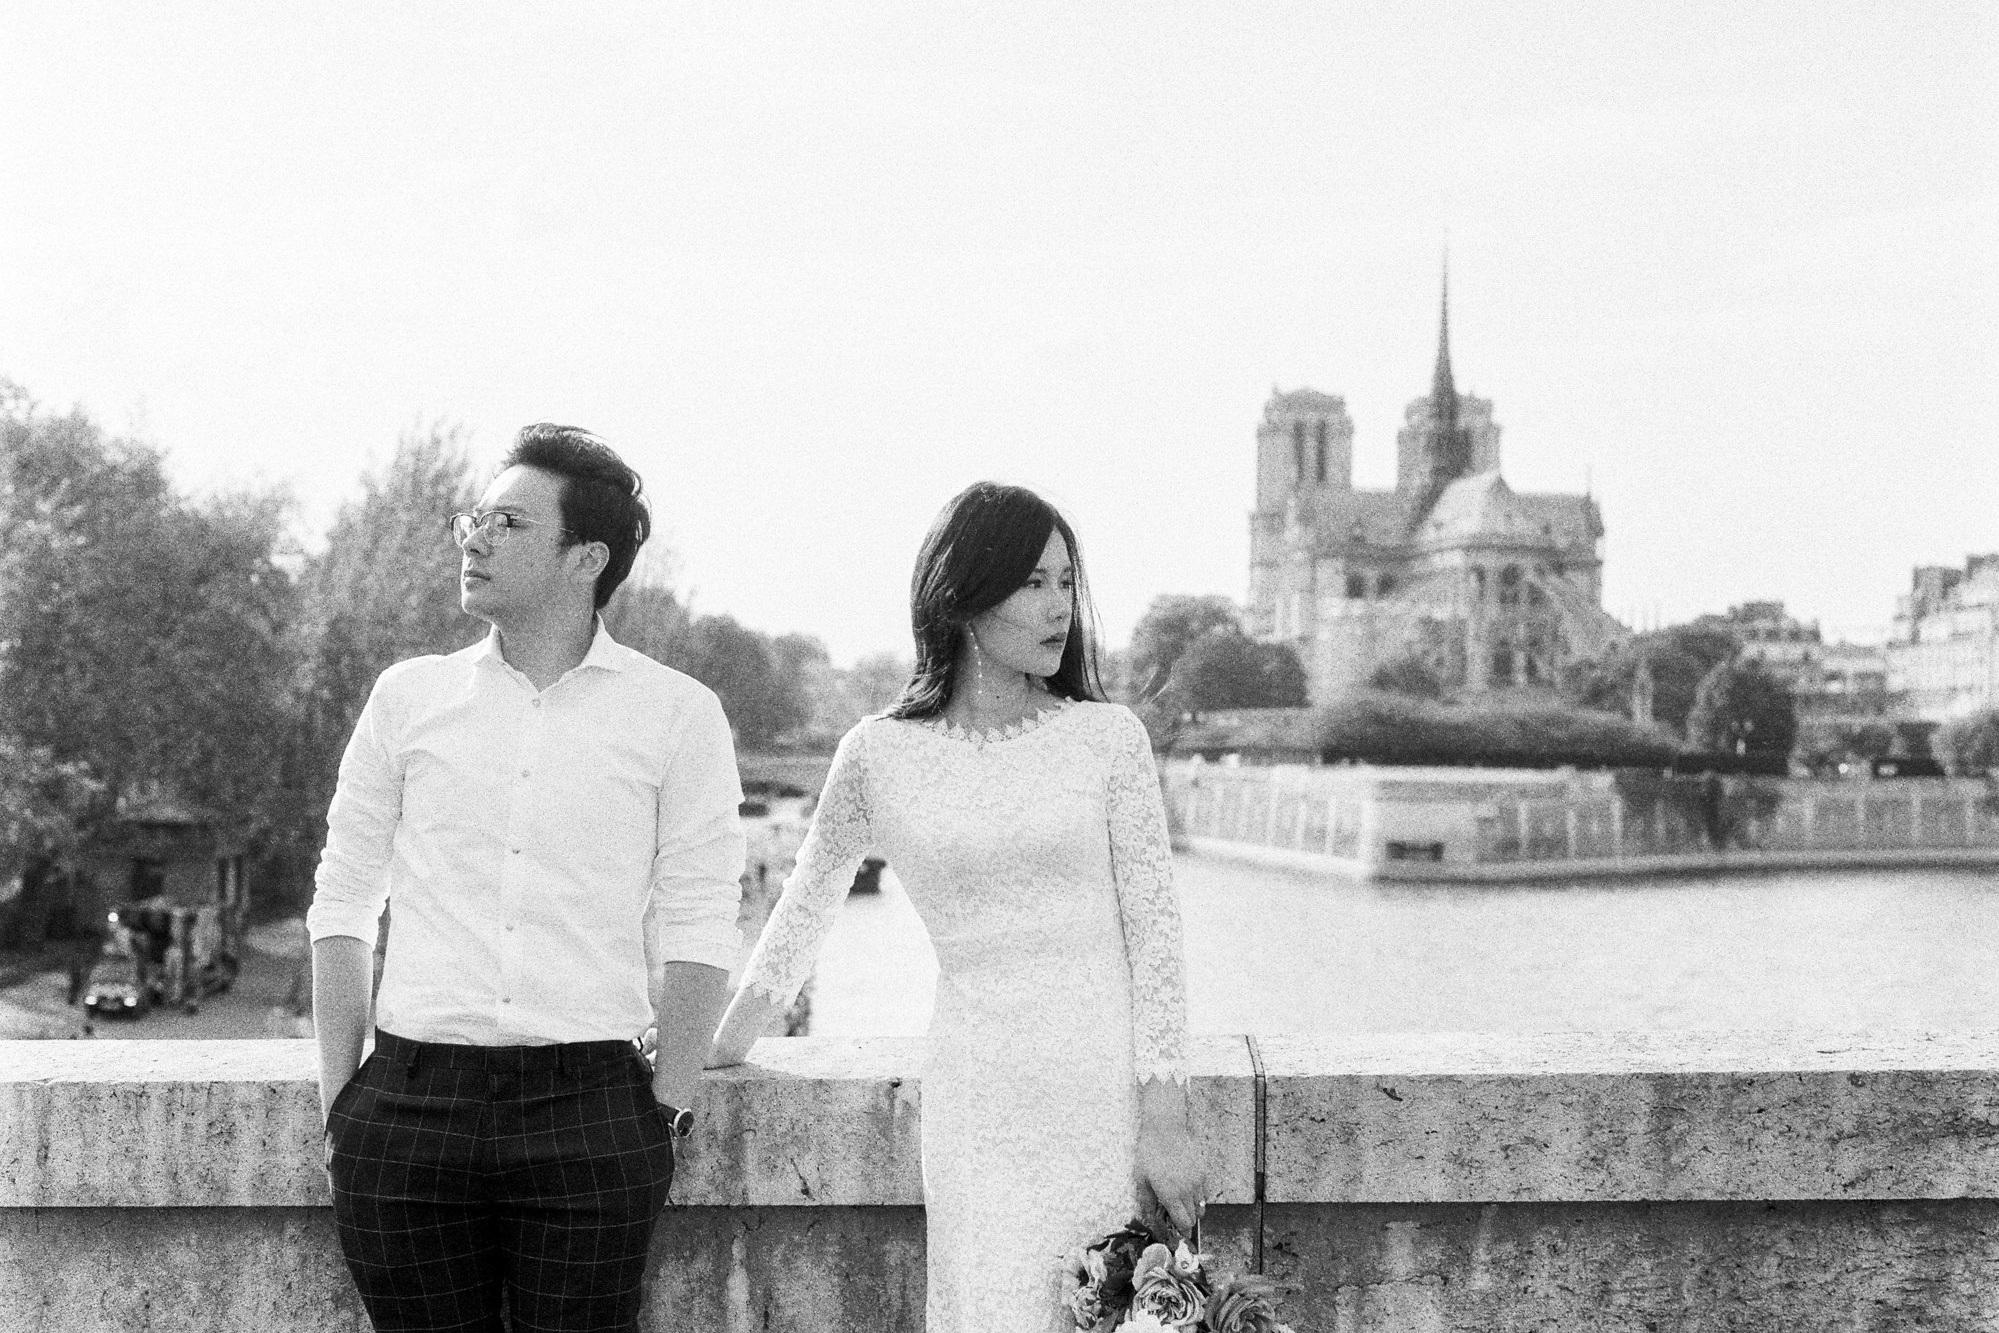 chymo_more_destination_film_wedding_photographer_europe-234.jpg